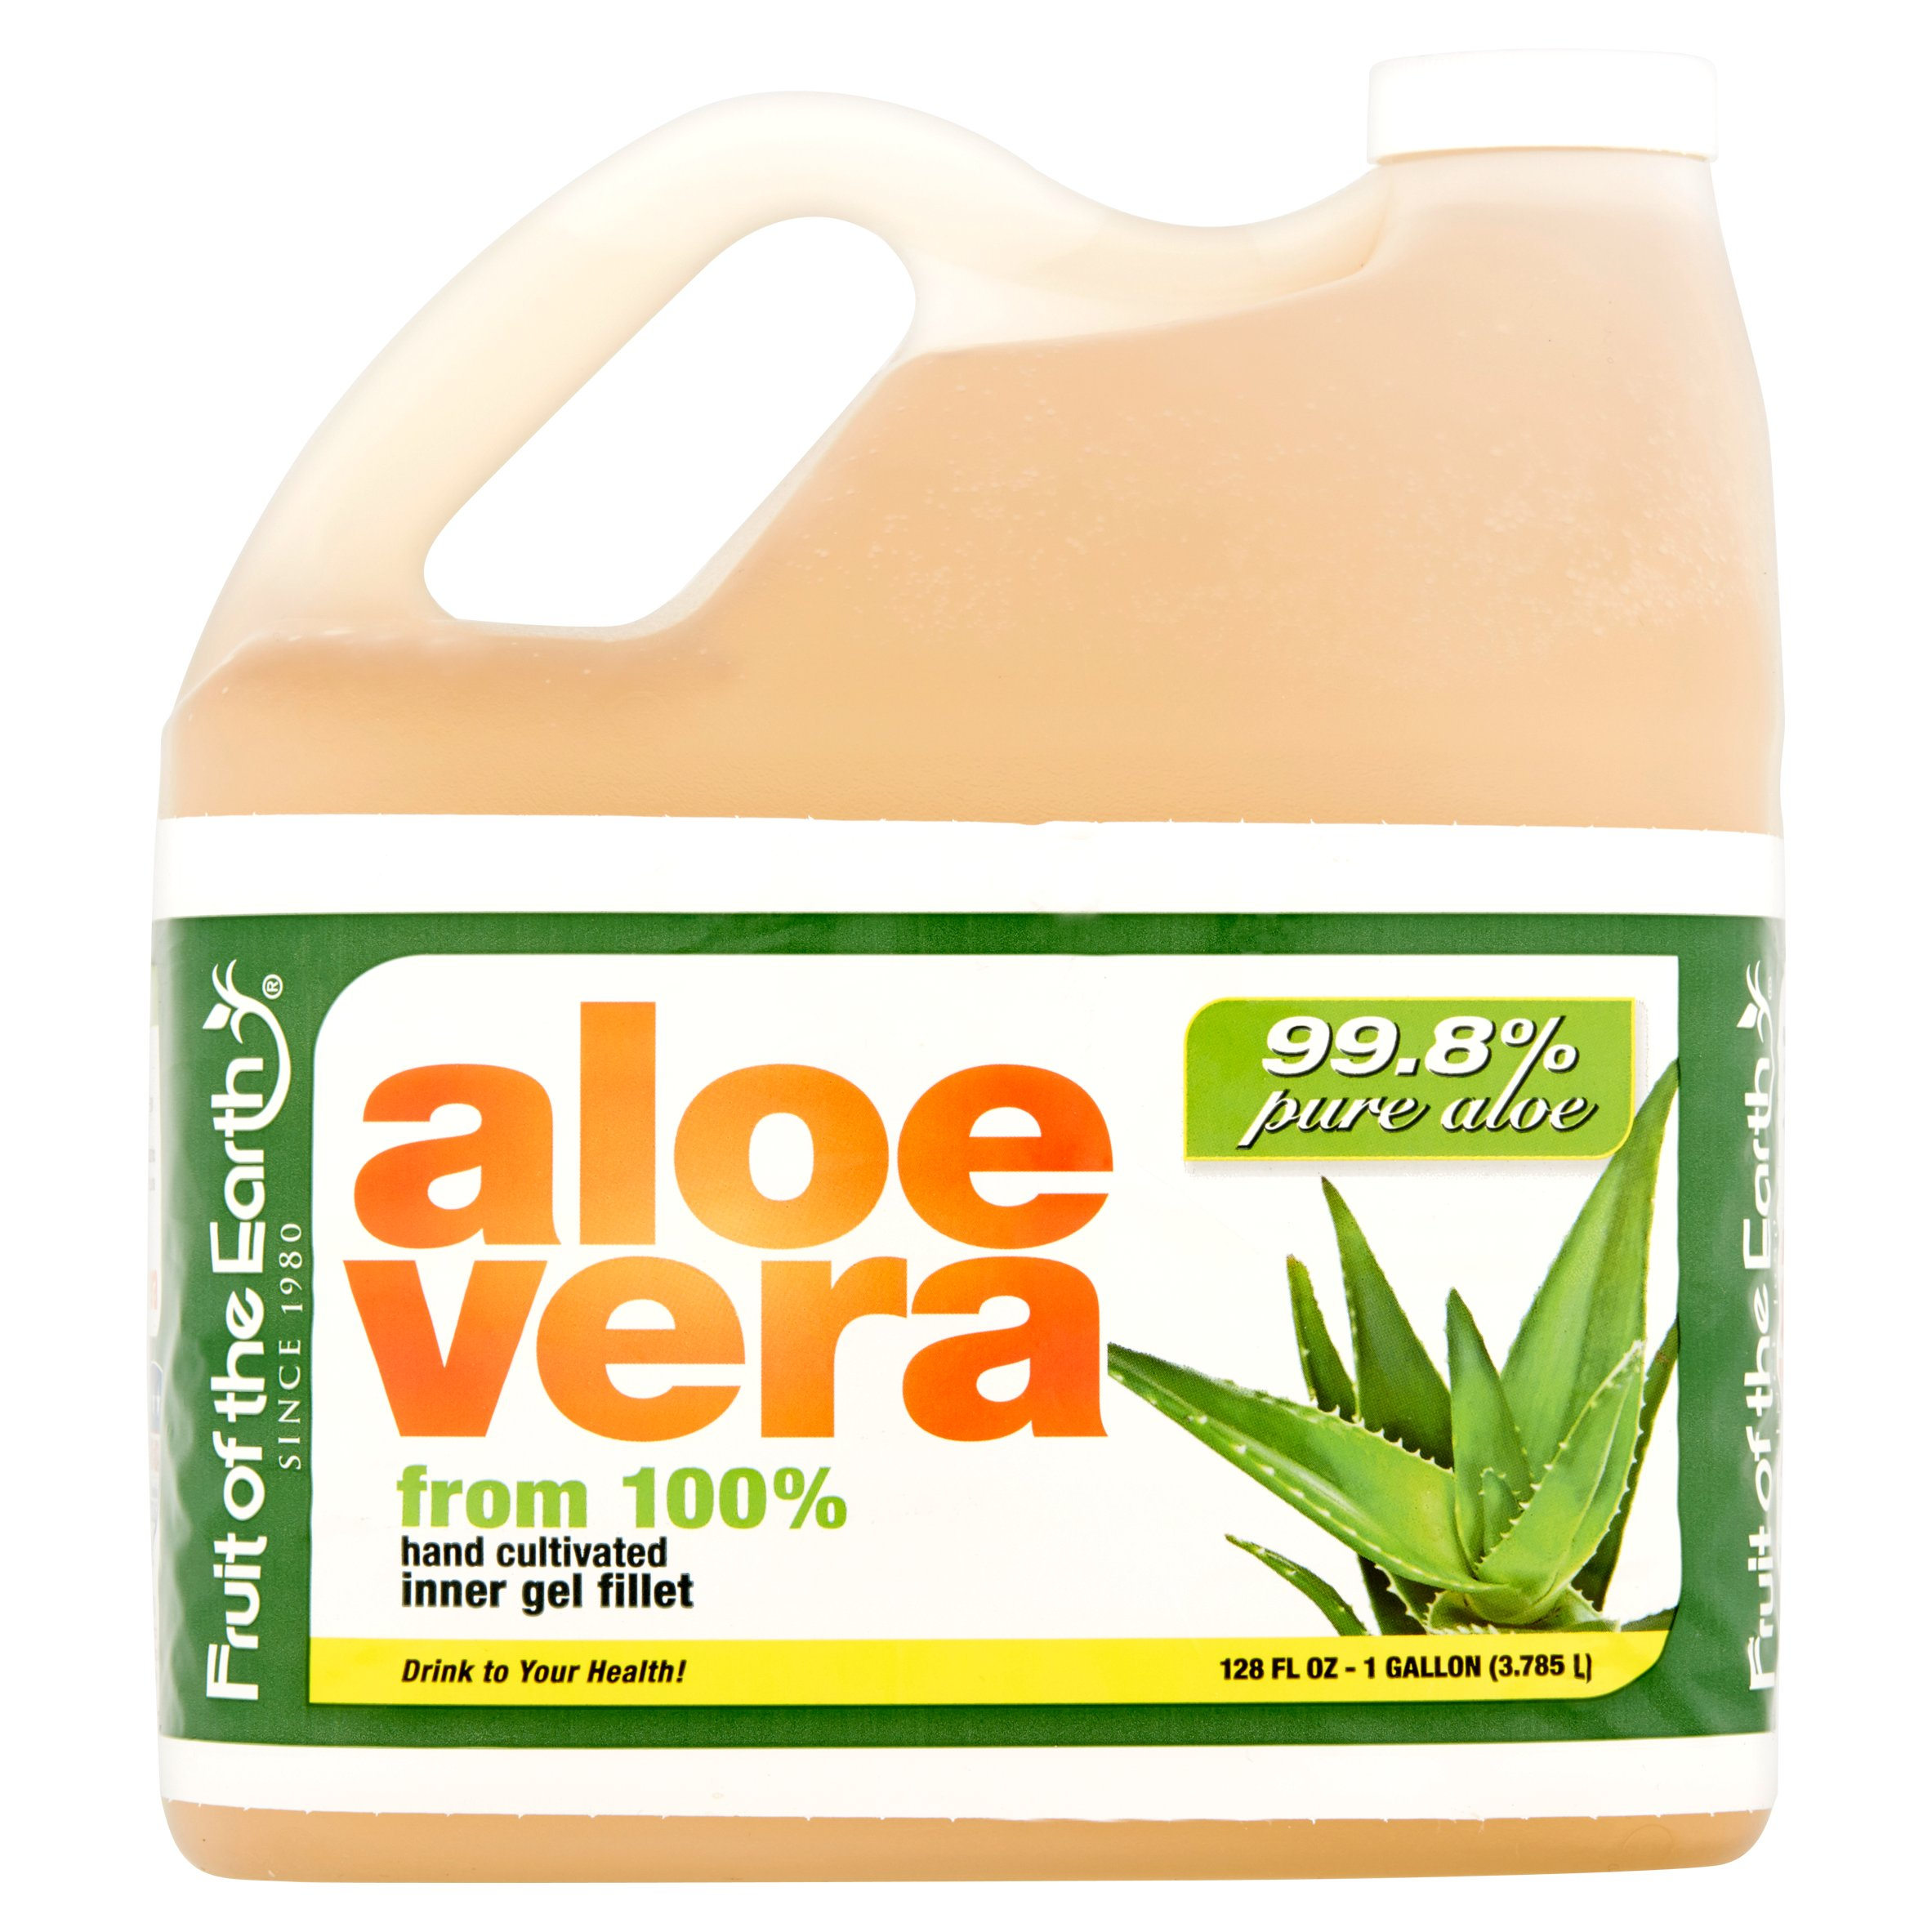 Fruit Of The Earth Aloe Vera Juice With 99.8% Aloe, 1 gal